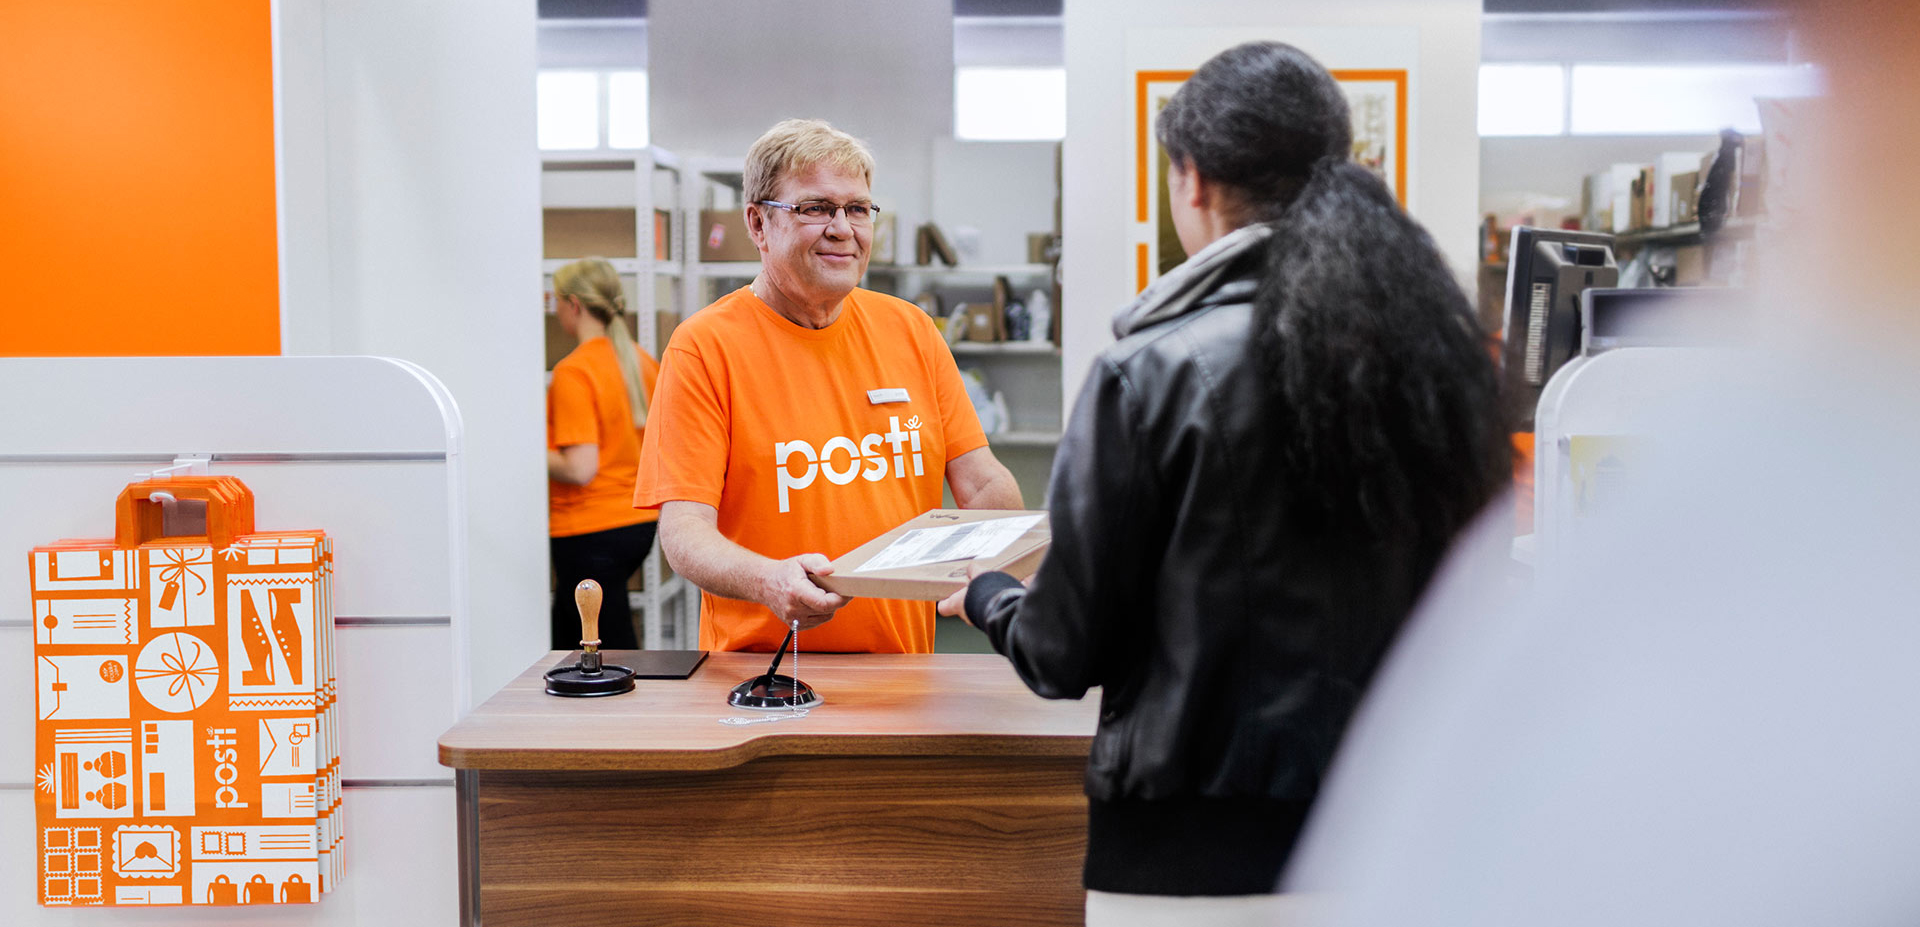 Parcel point of Posti